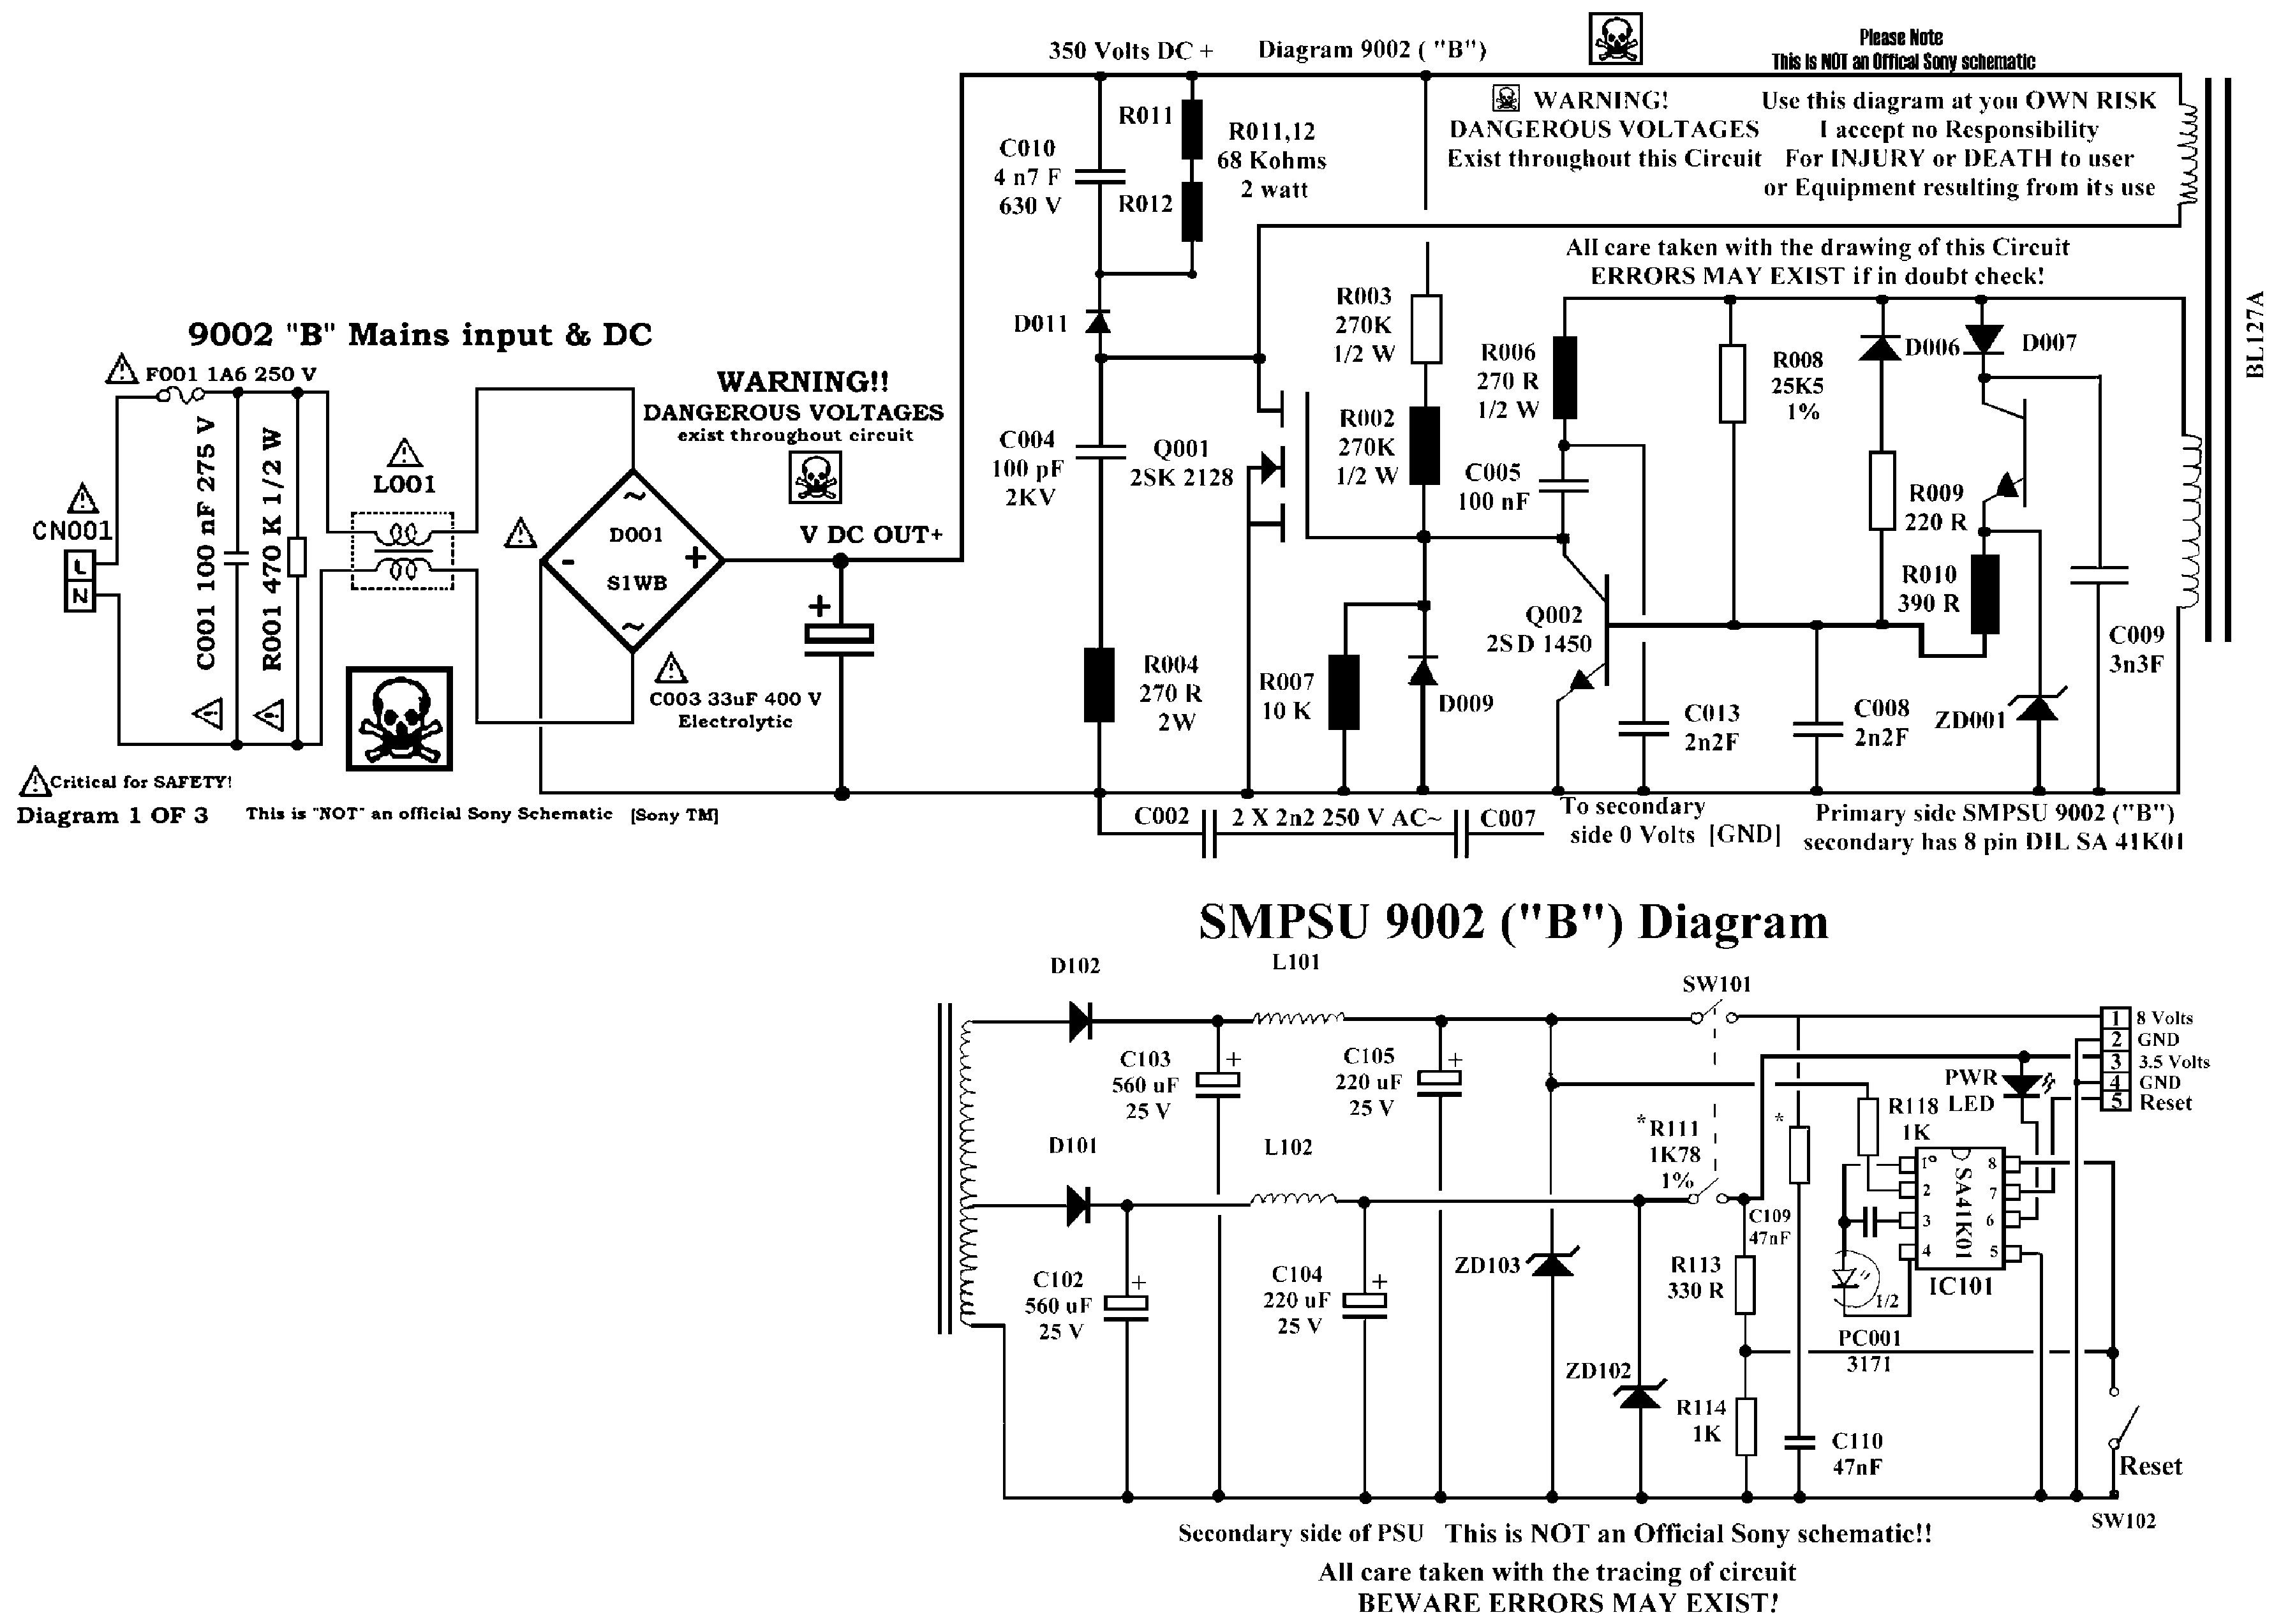 dualshock 2 wiring diagram no 1353  playstation to usb wiring diagram schematic wiring  playstation to usb wiring diagram